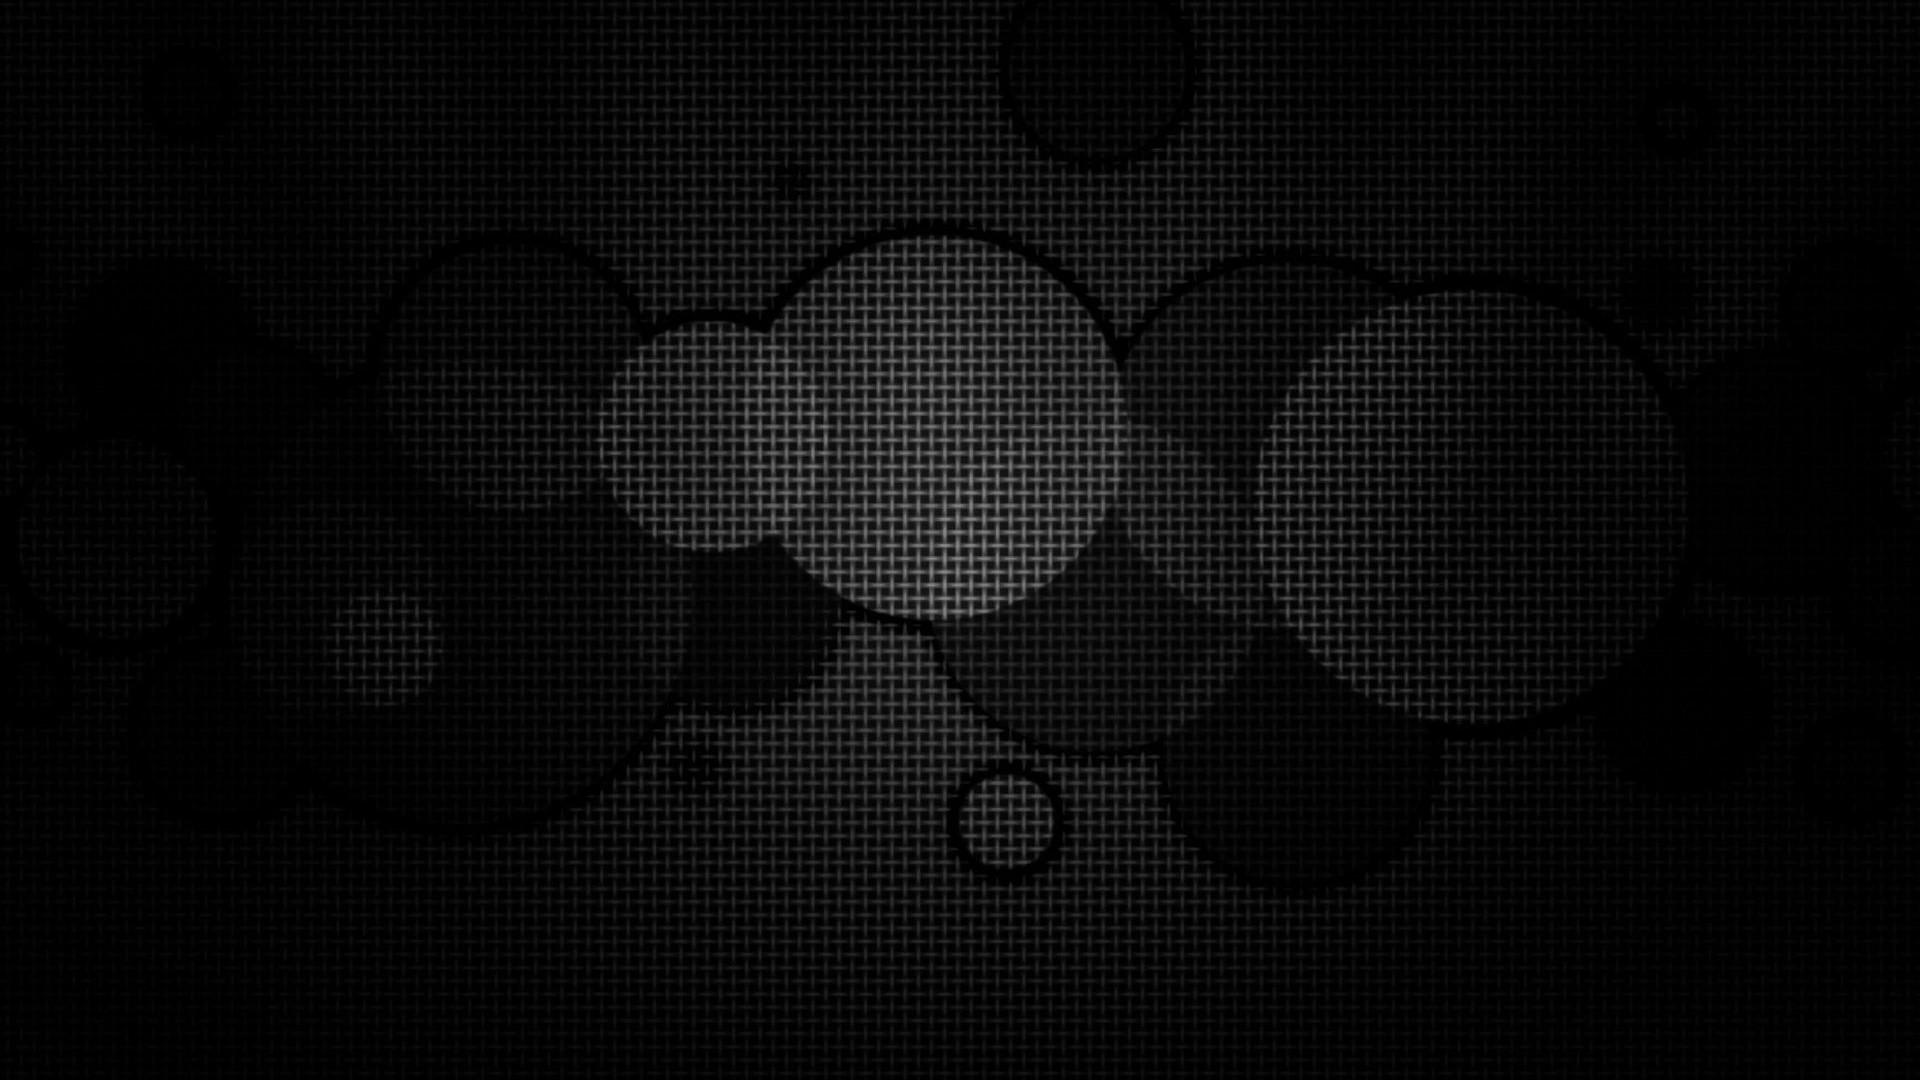 Dark Hd Wallpapers 1080p 68 Images